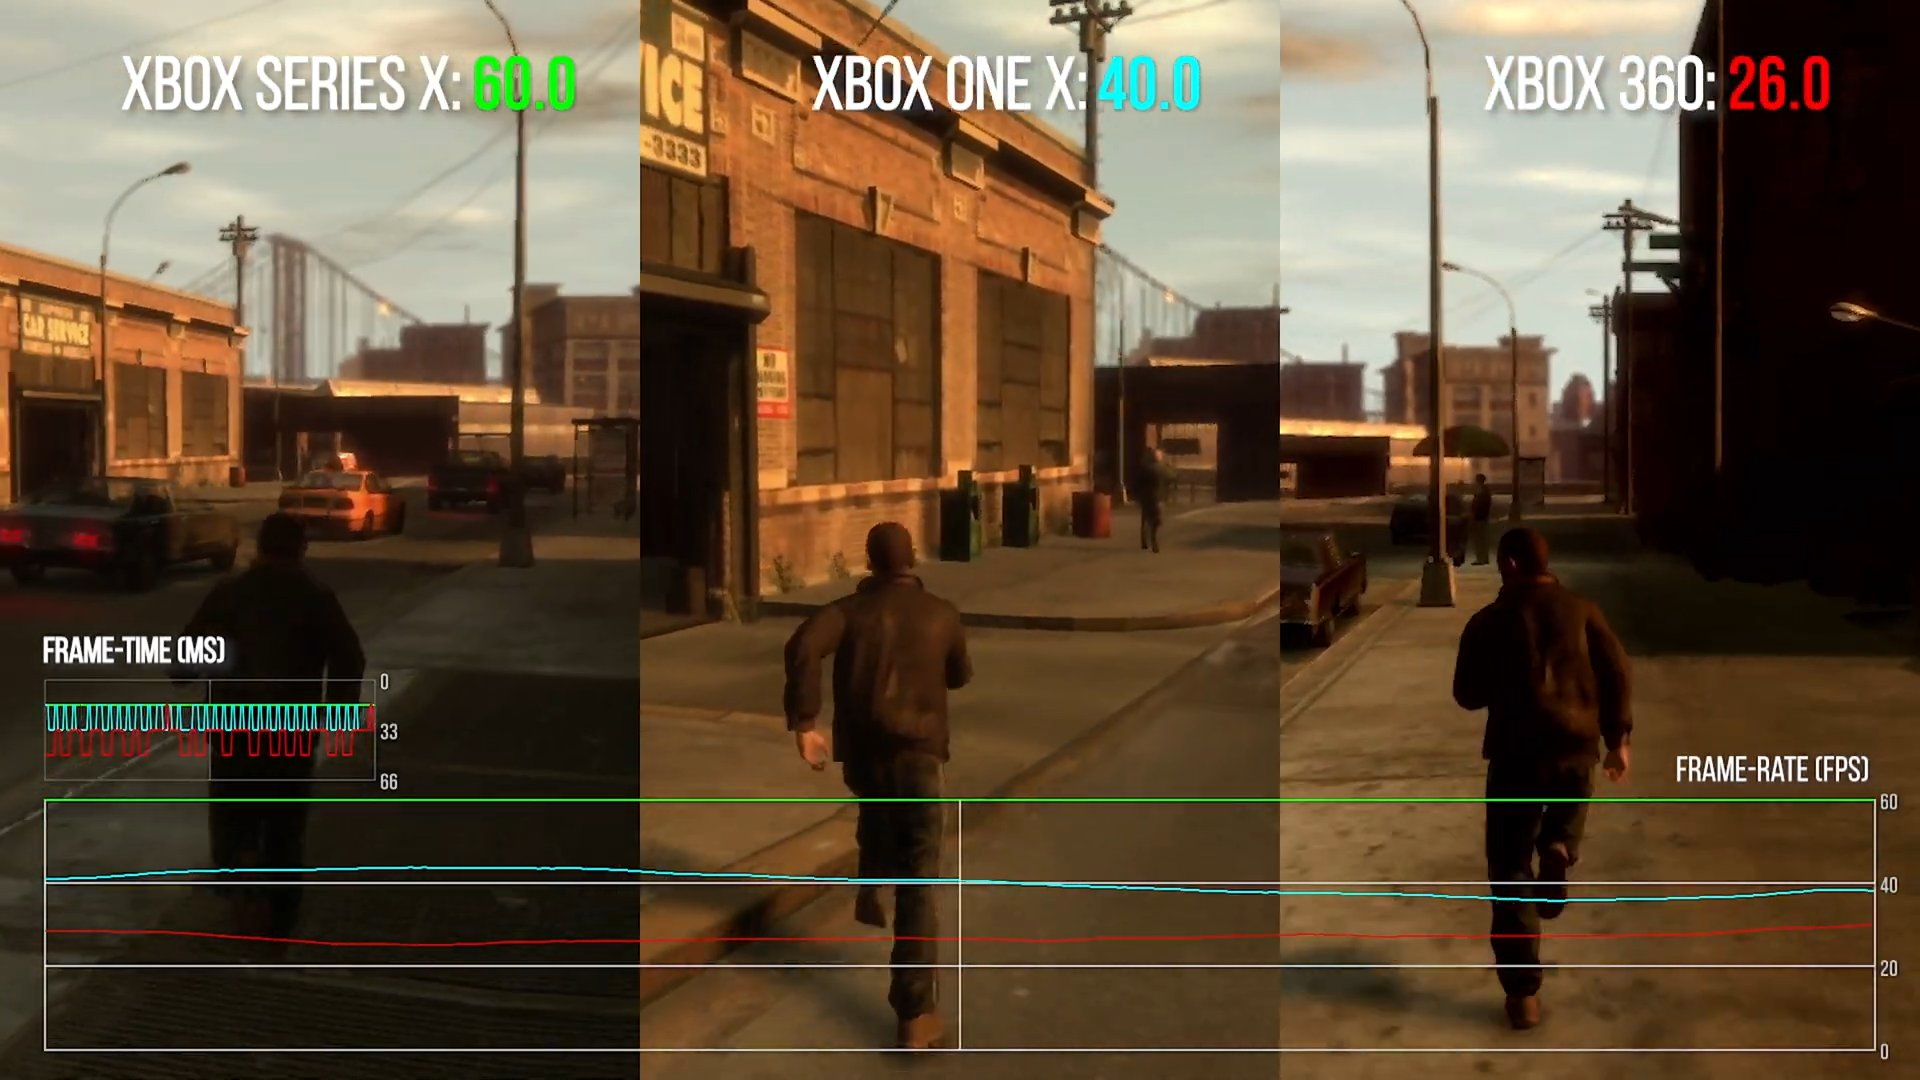 225135-Xbox%20Series%20X%20Backwards%20C